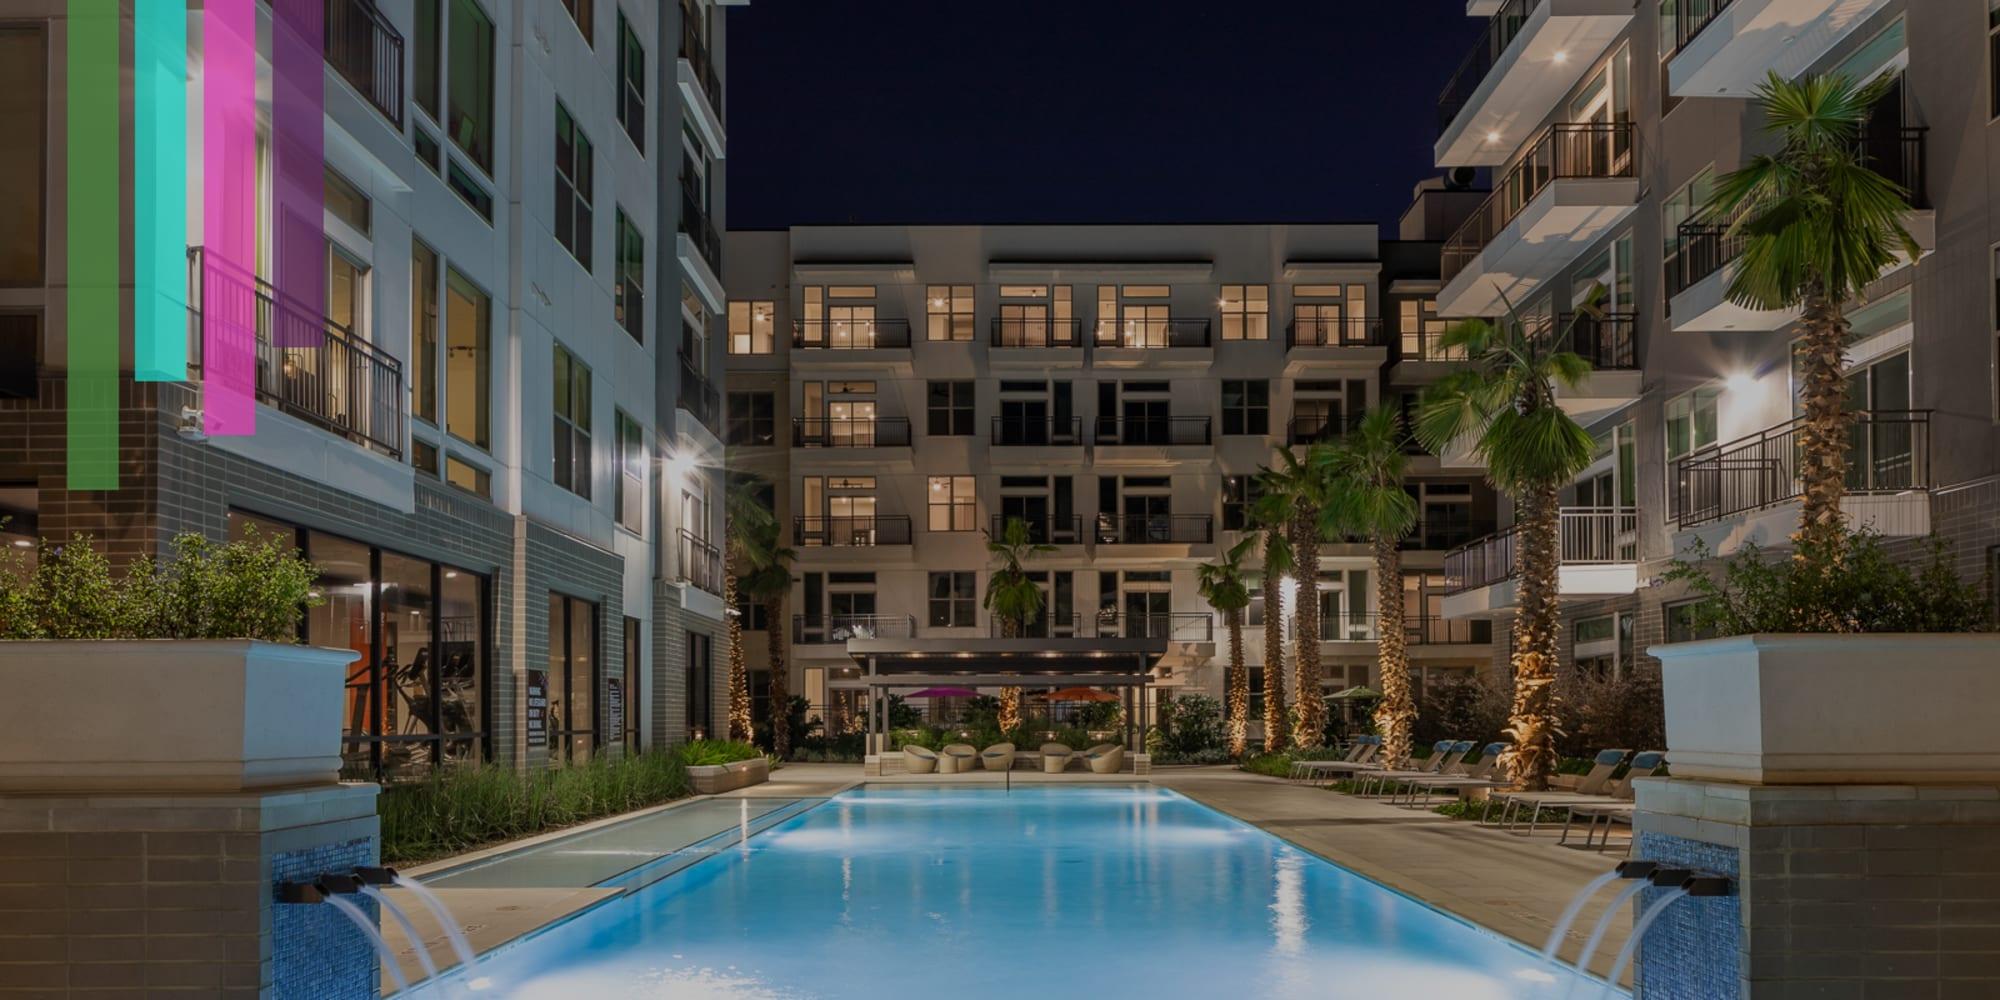 Pool at Bellrock Summer Street in Houston, Texas